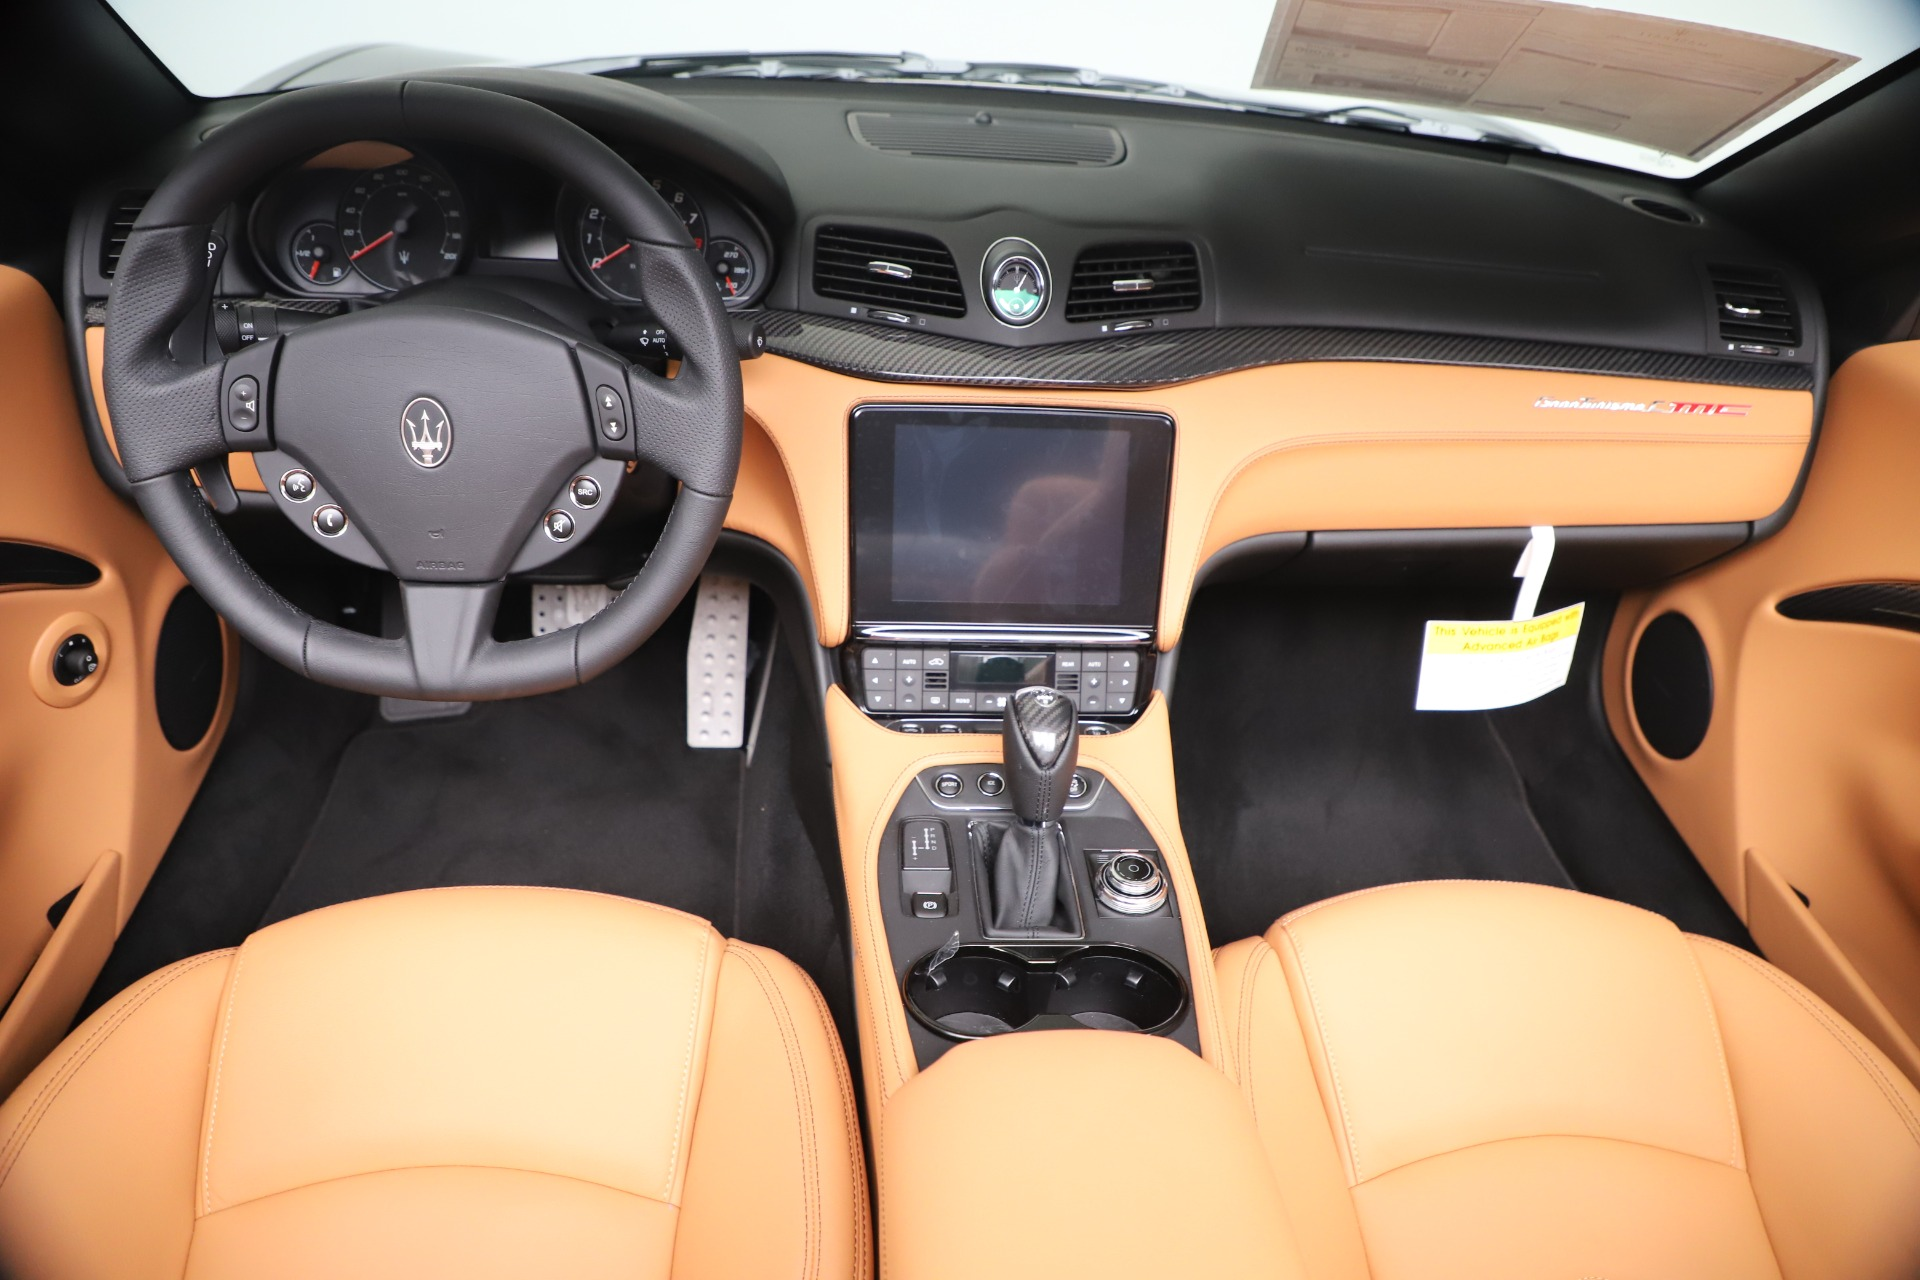 New 2019 Maserati GranTurismo MC Convertible For Sale In Westport, CT 3468_p22